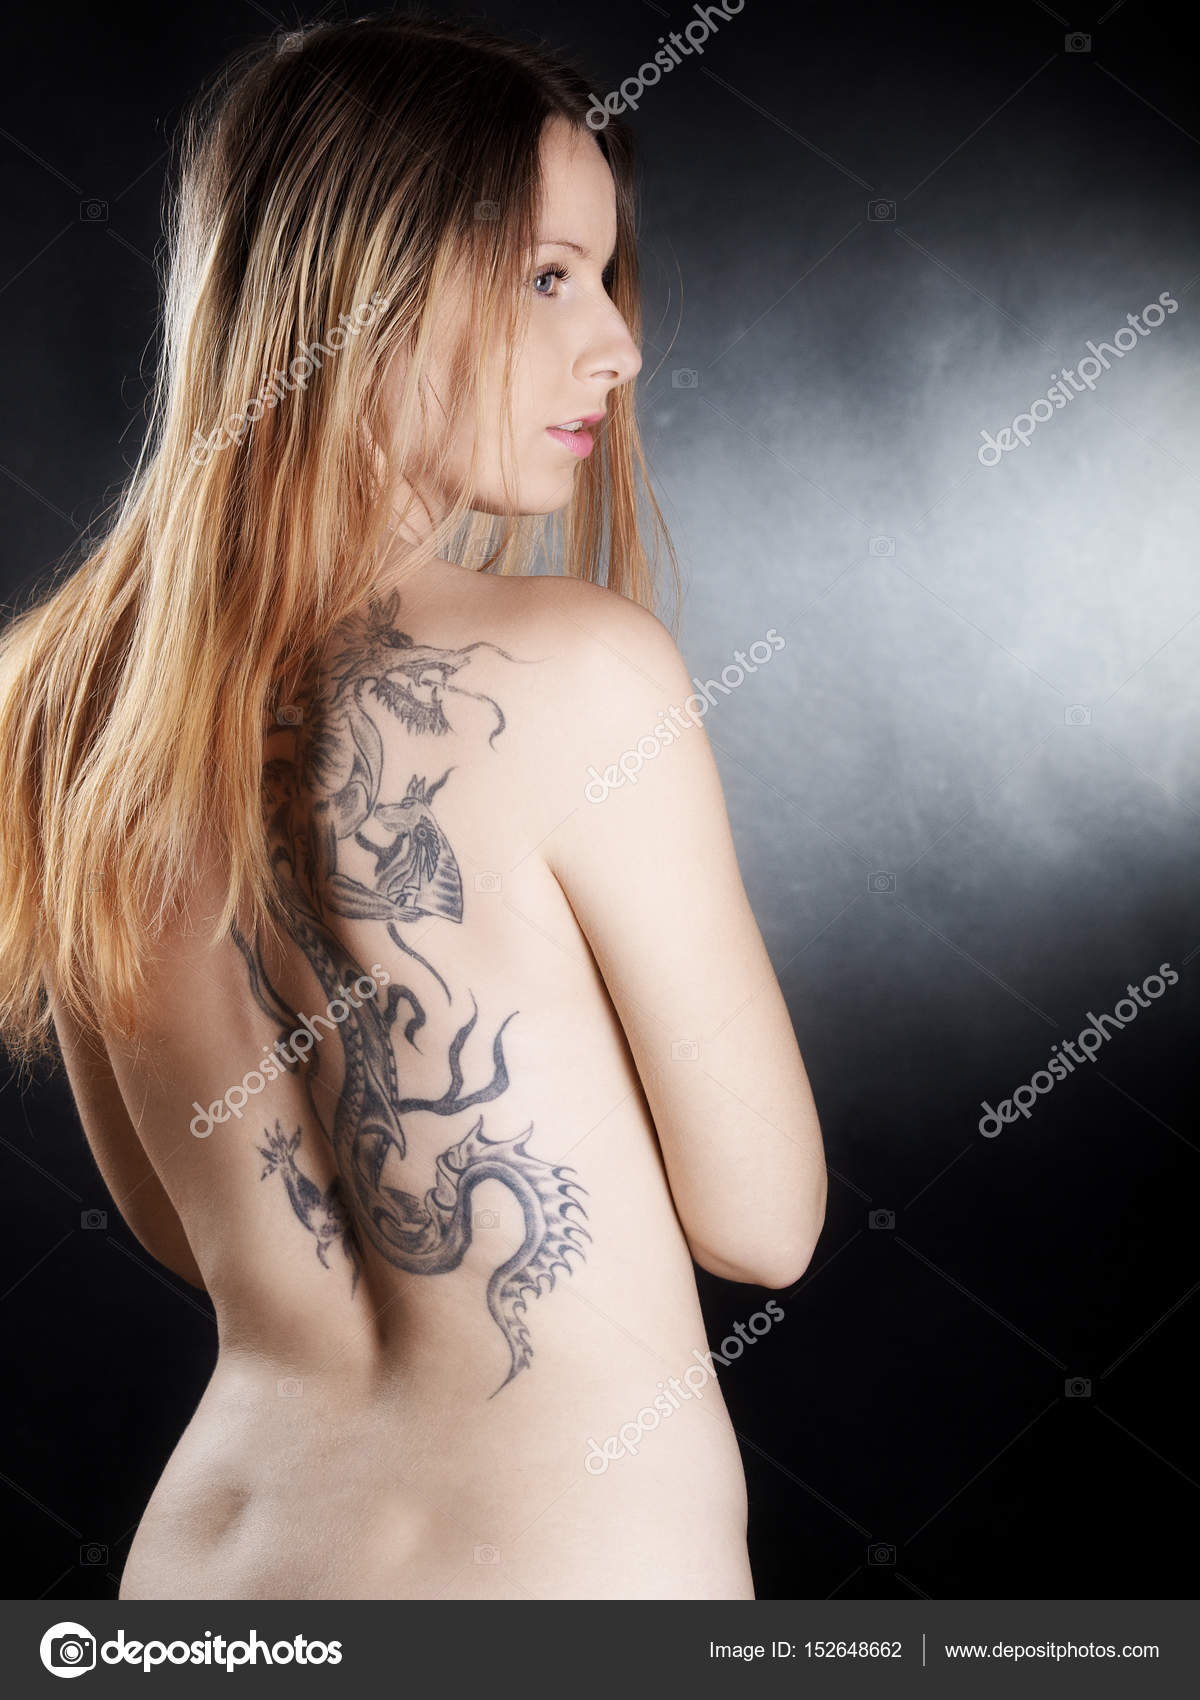 schwangere tattoos nackte girls